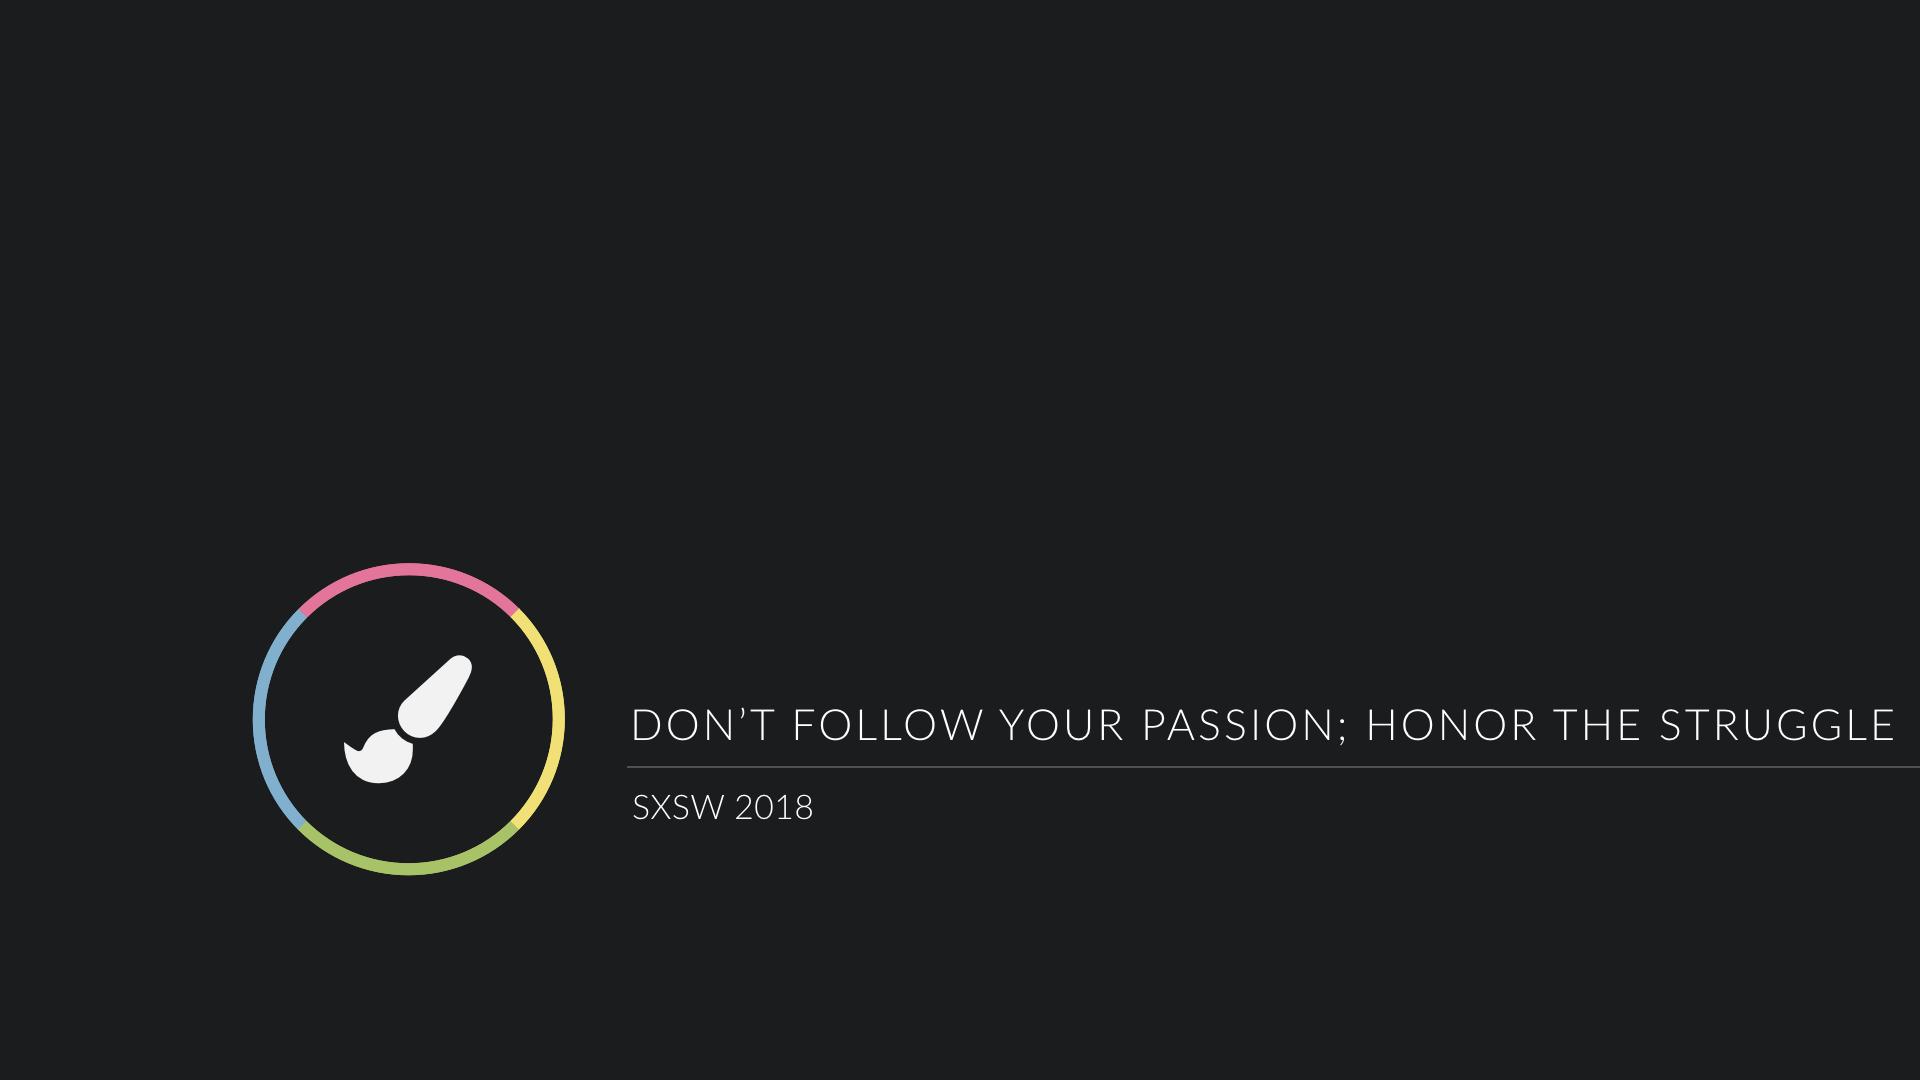 SXSW 2018 - Don't Follow Your Passion.001.jpeg